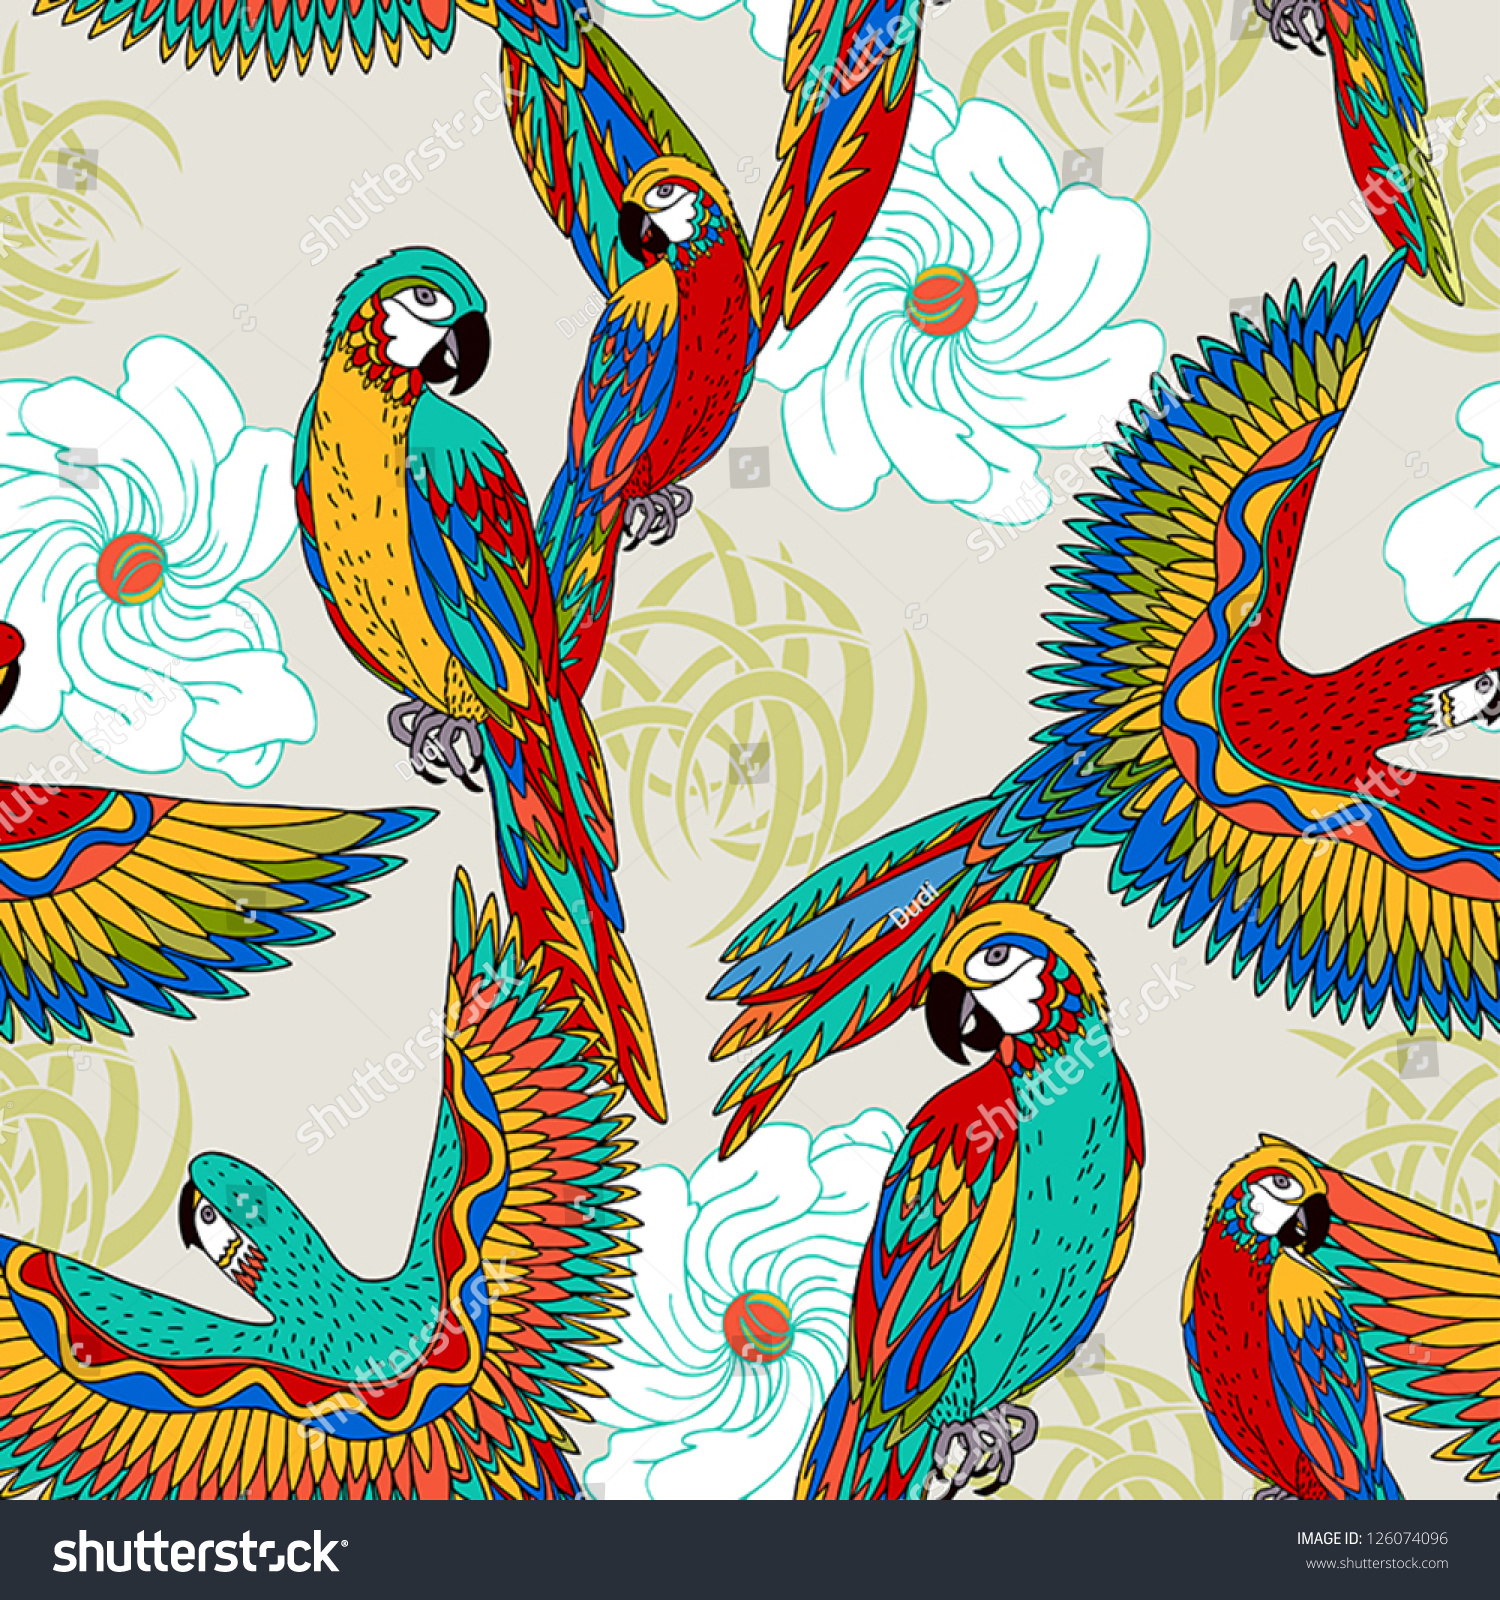 Colorful vintage background patterns - photo#21